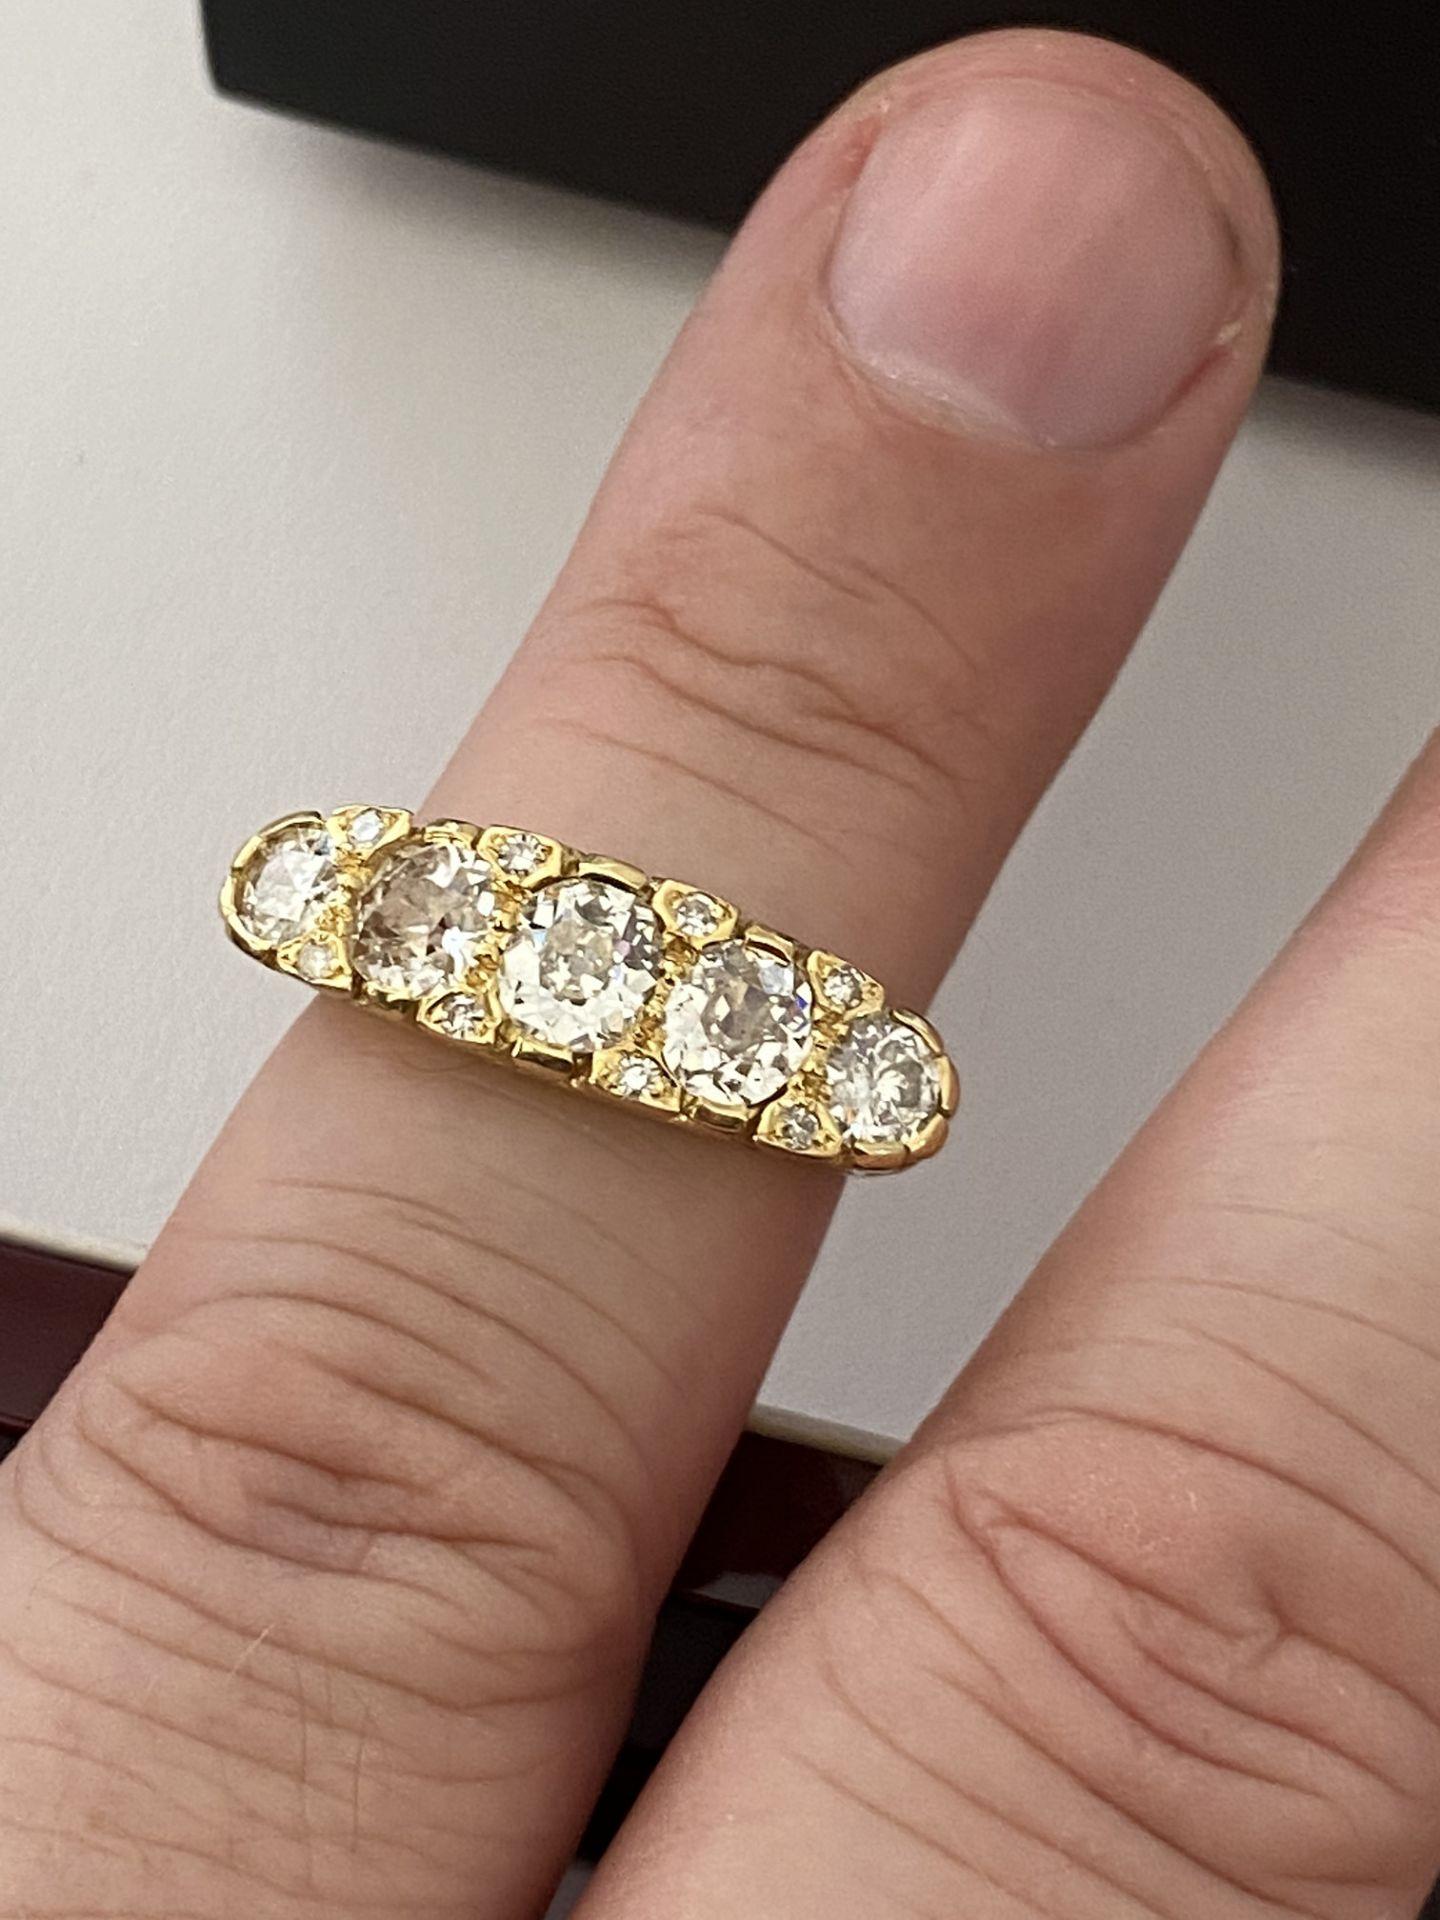 FINE 18ct YELLOW GOLD 2.00ct 5 STONE DIAMOND RING - Image 12 of 15